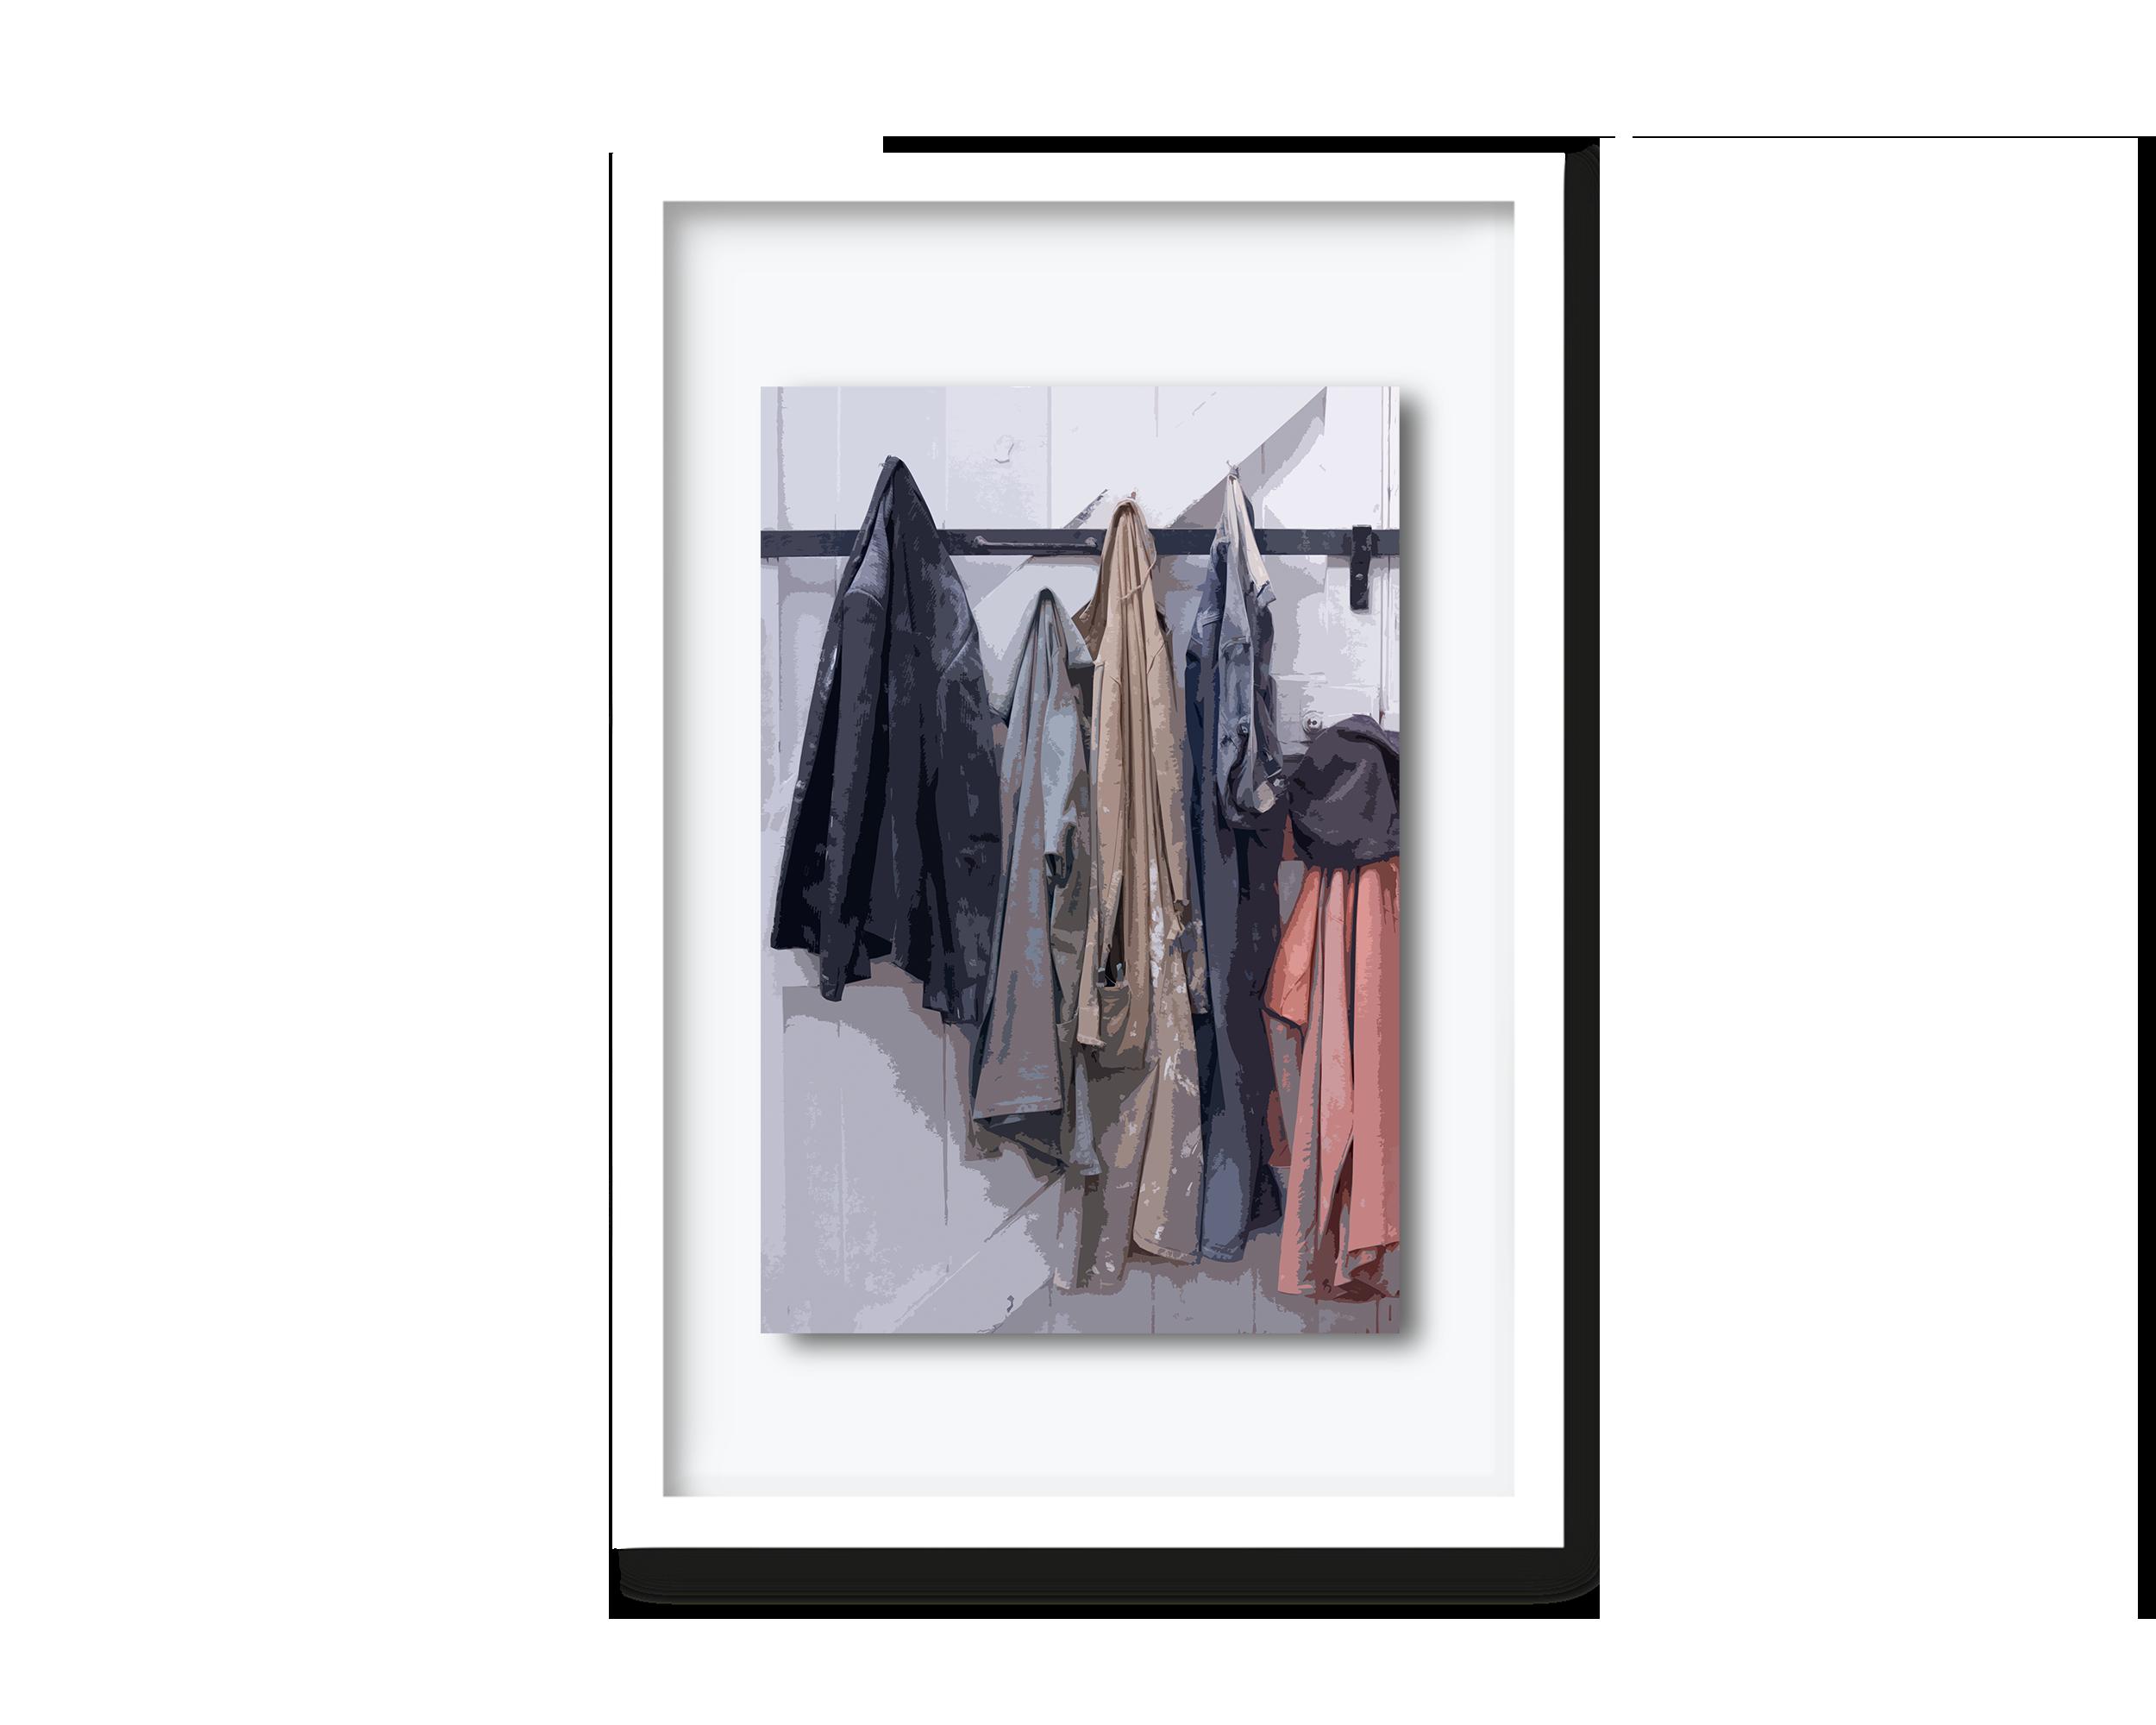 51.david-pearce-hepworth-coats.png